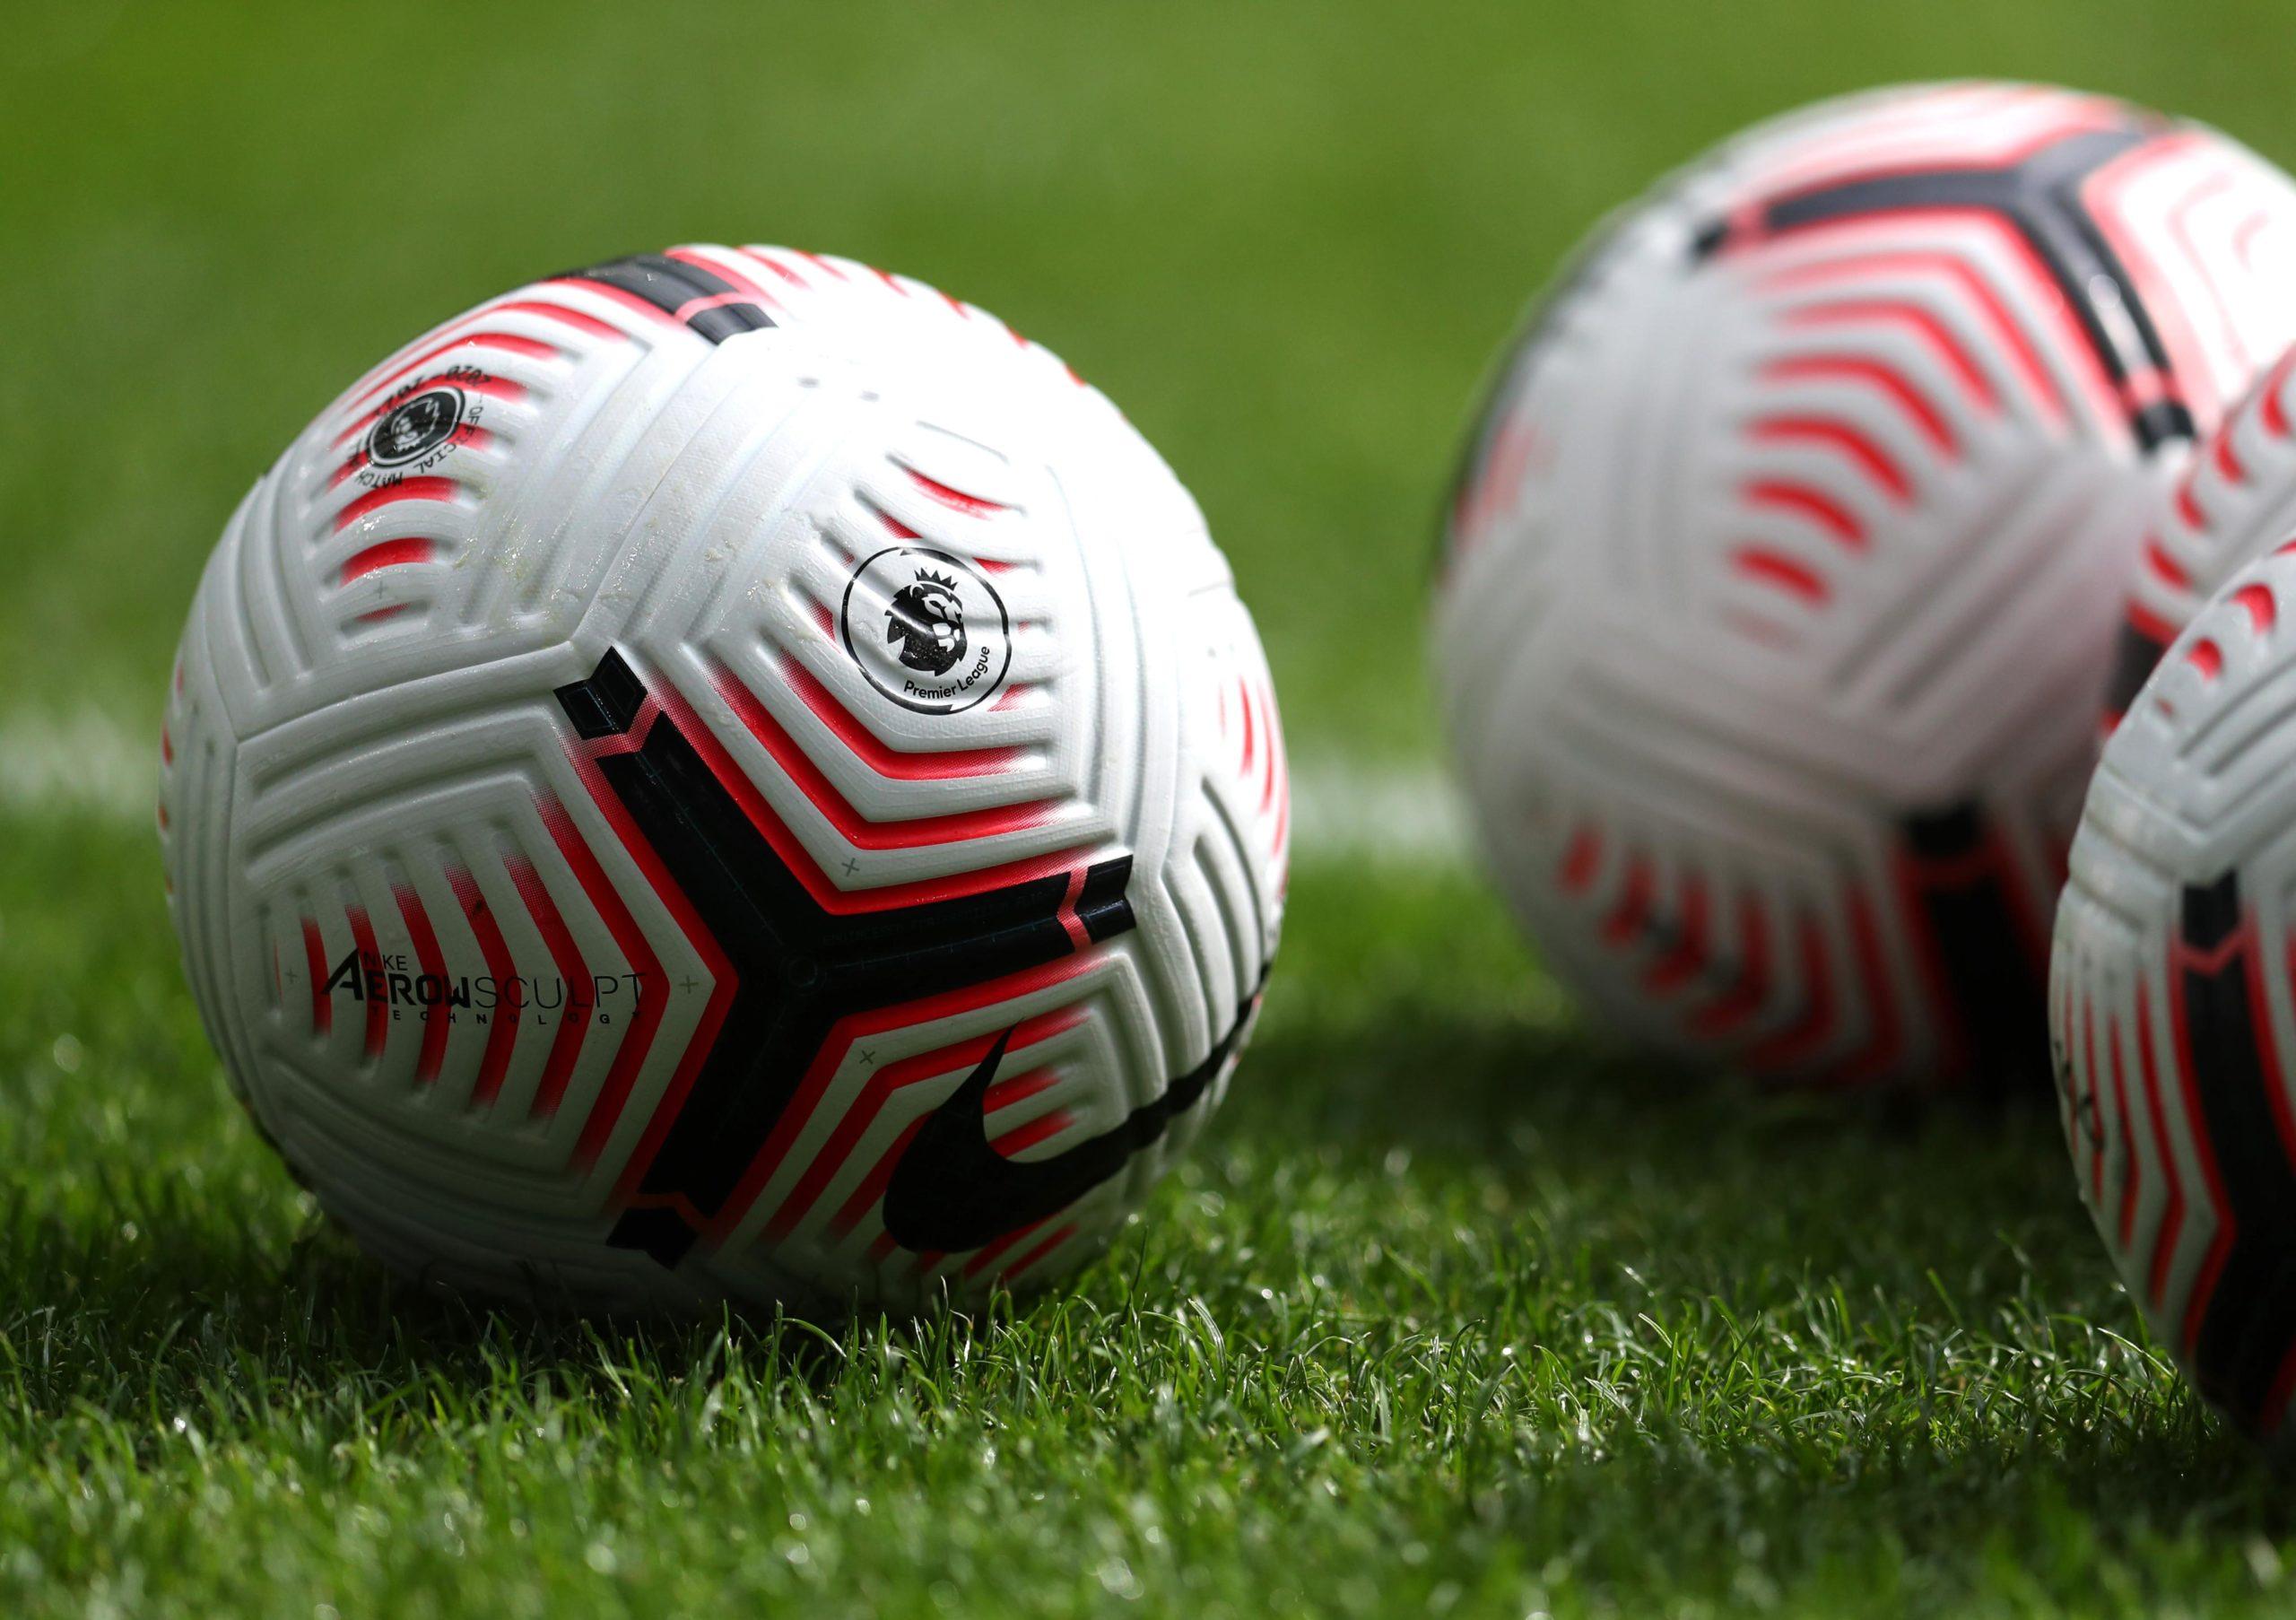 Premier League Preview 2020/21: Gameweek 1